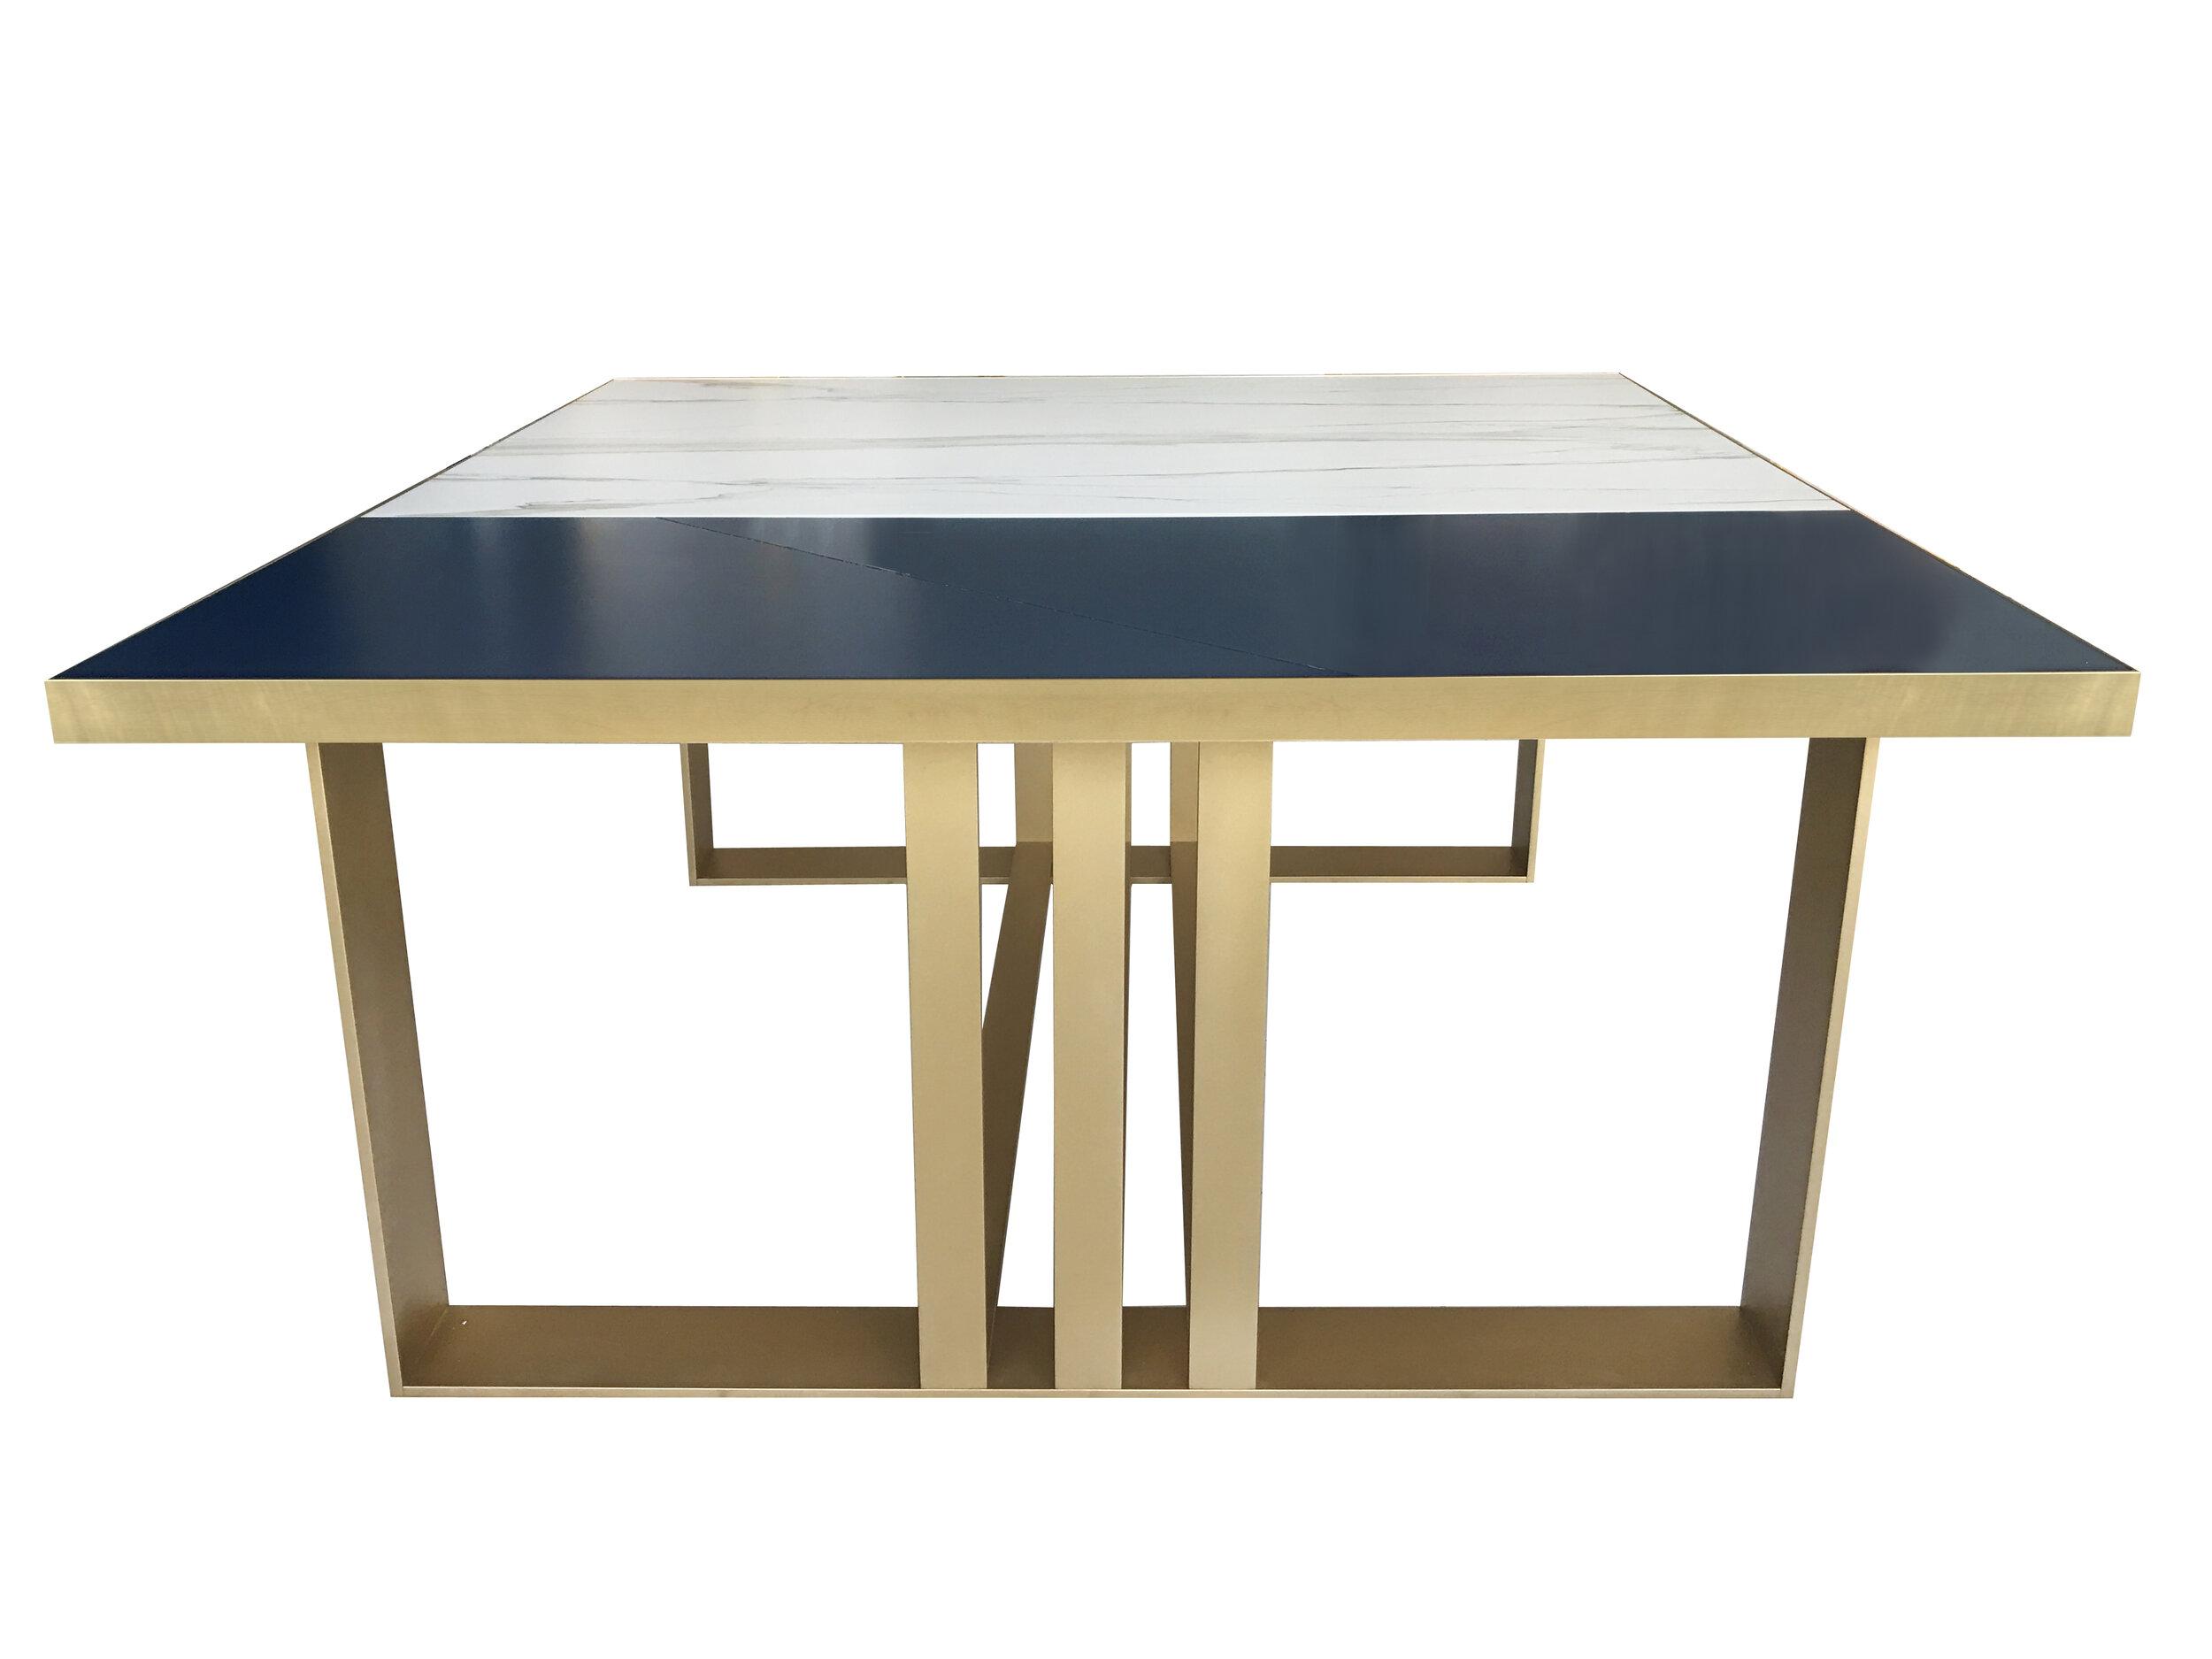 009.TABLE.02.jpg